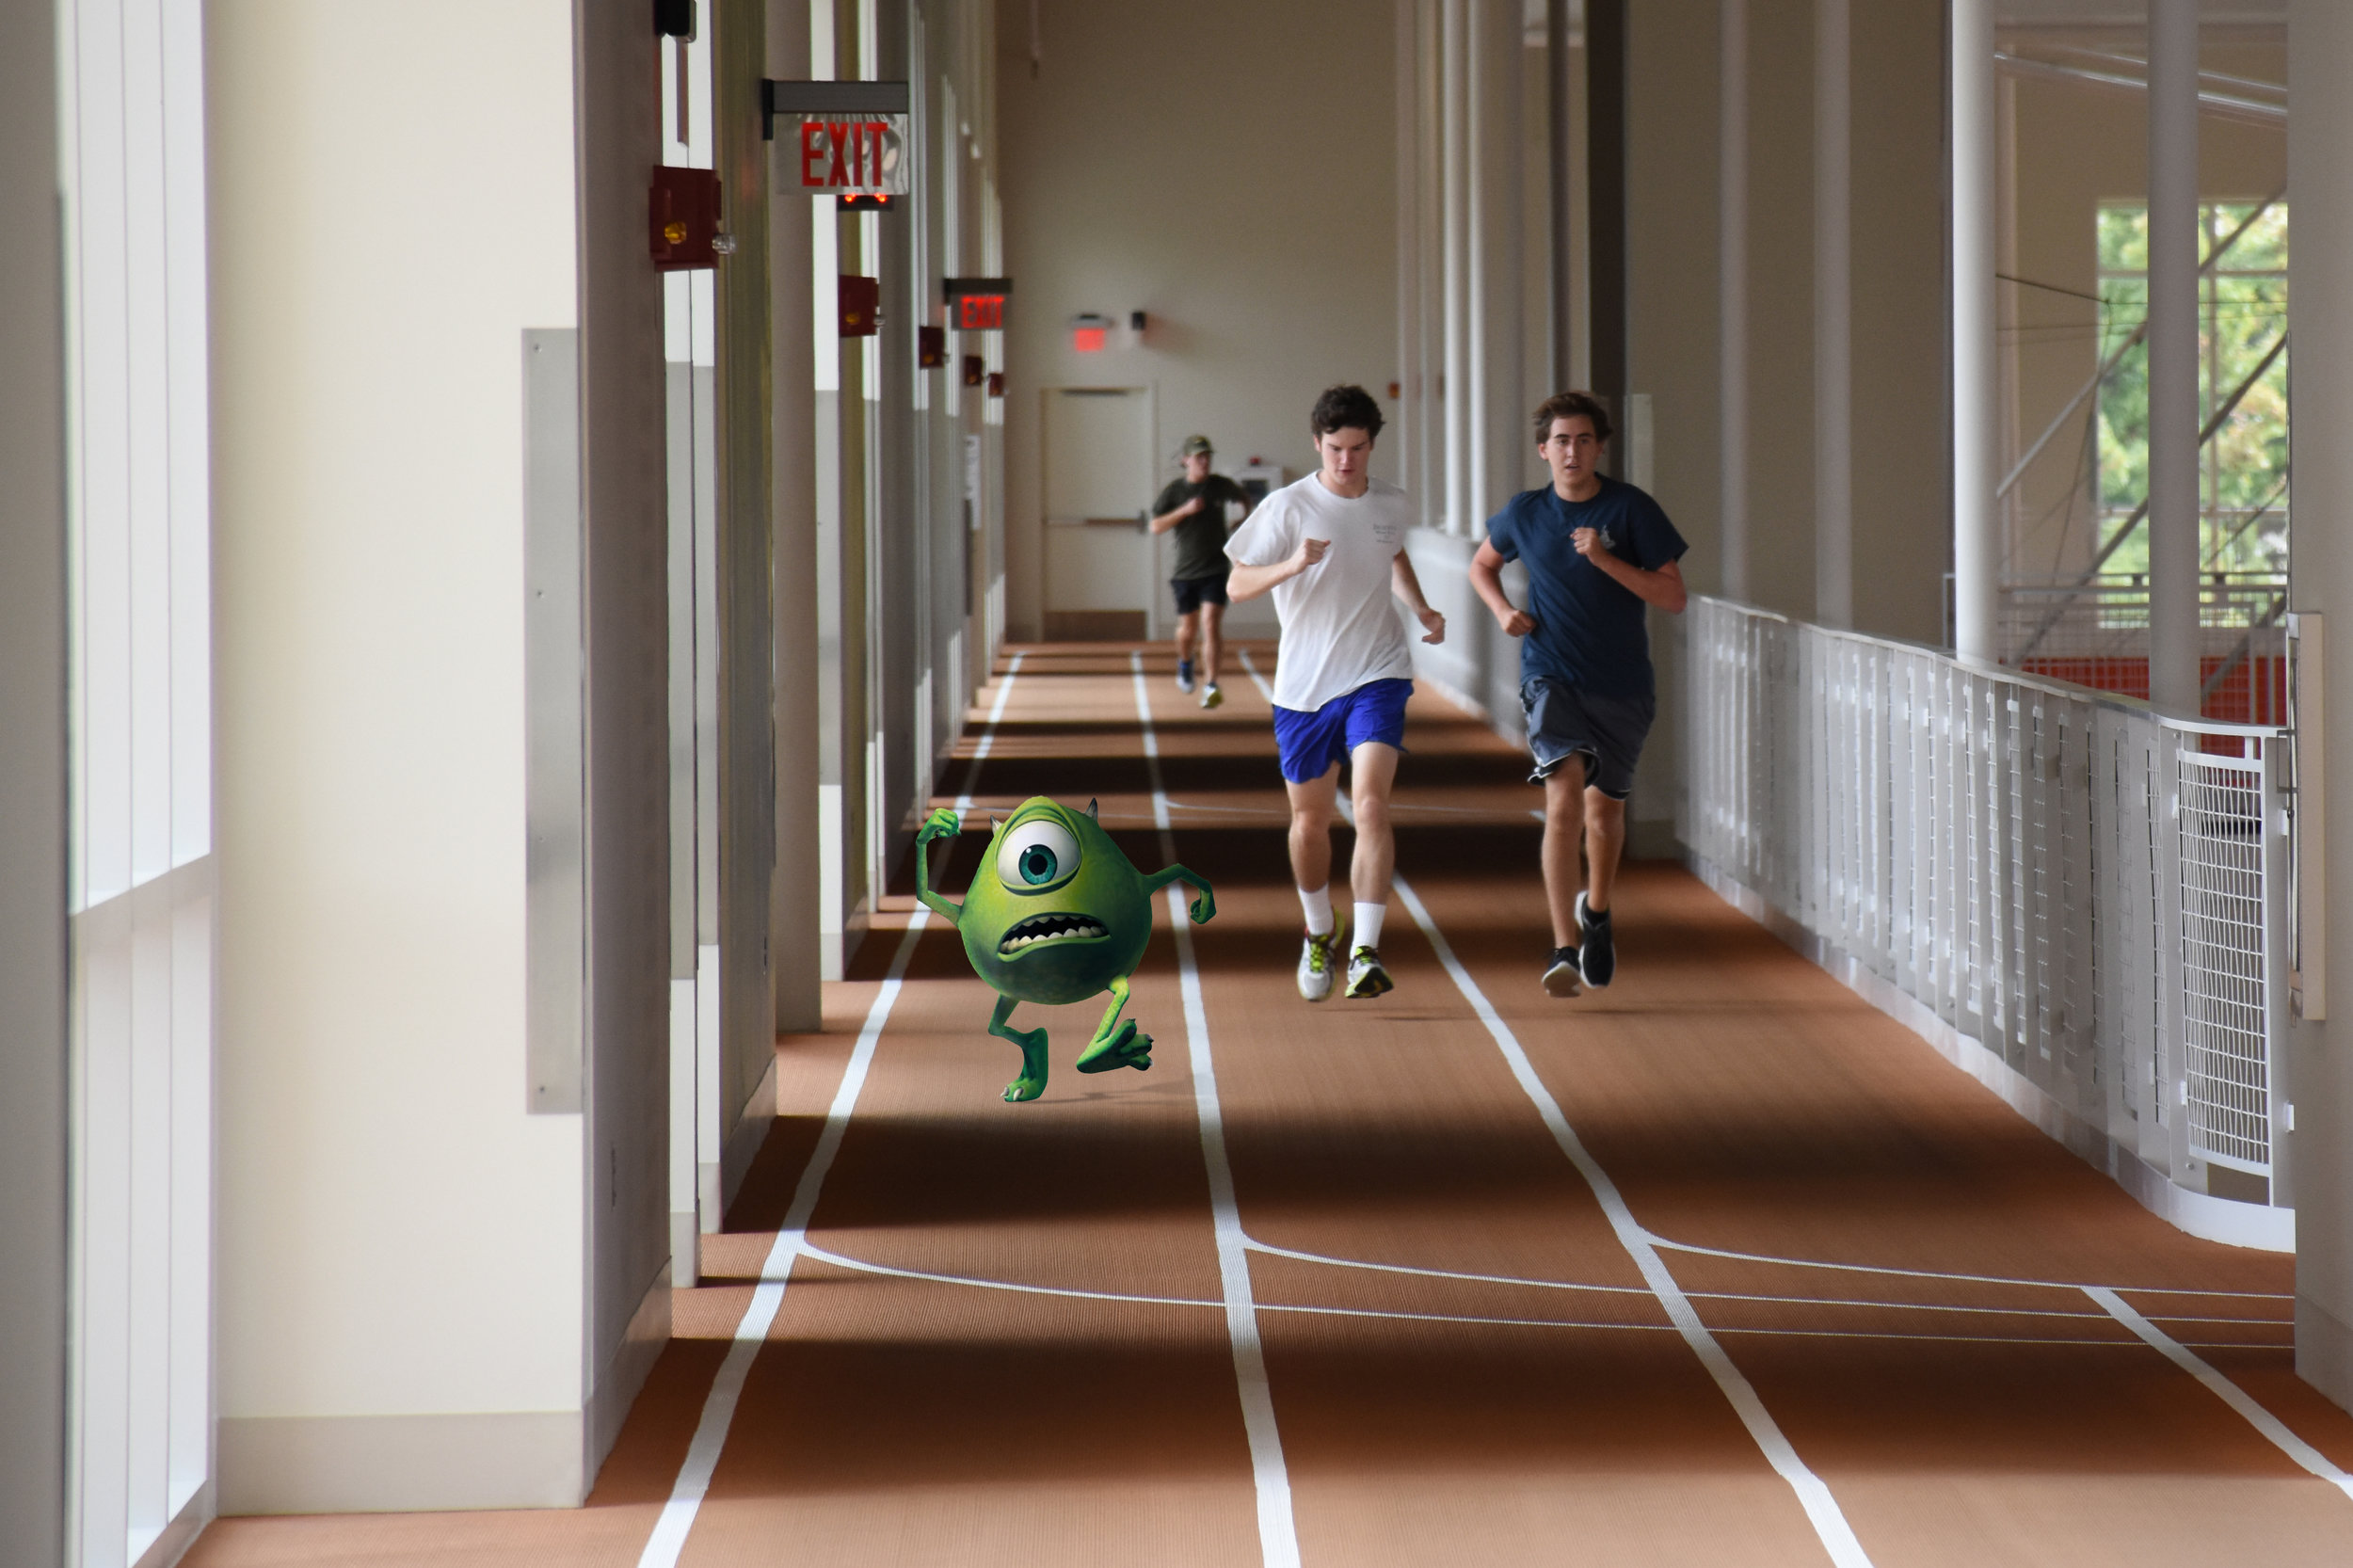 14 Types of Workout Buddies Explained as Disney Sidekicks